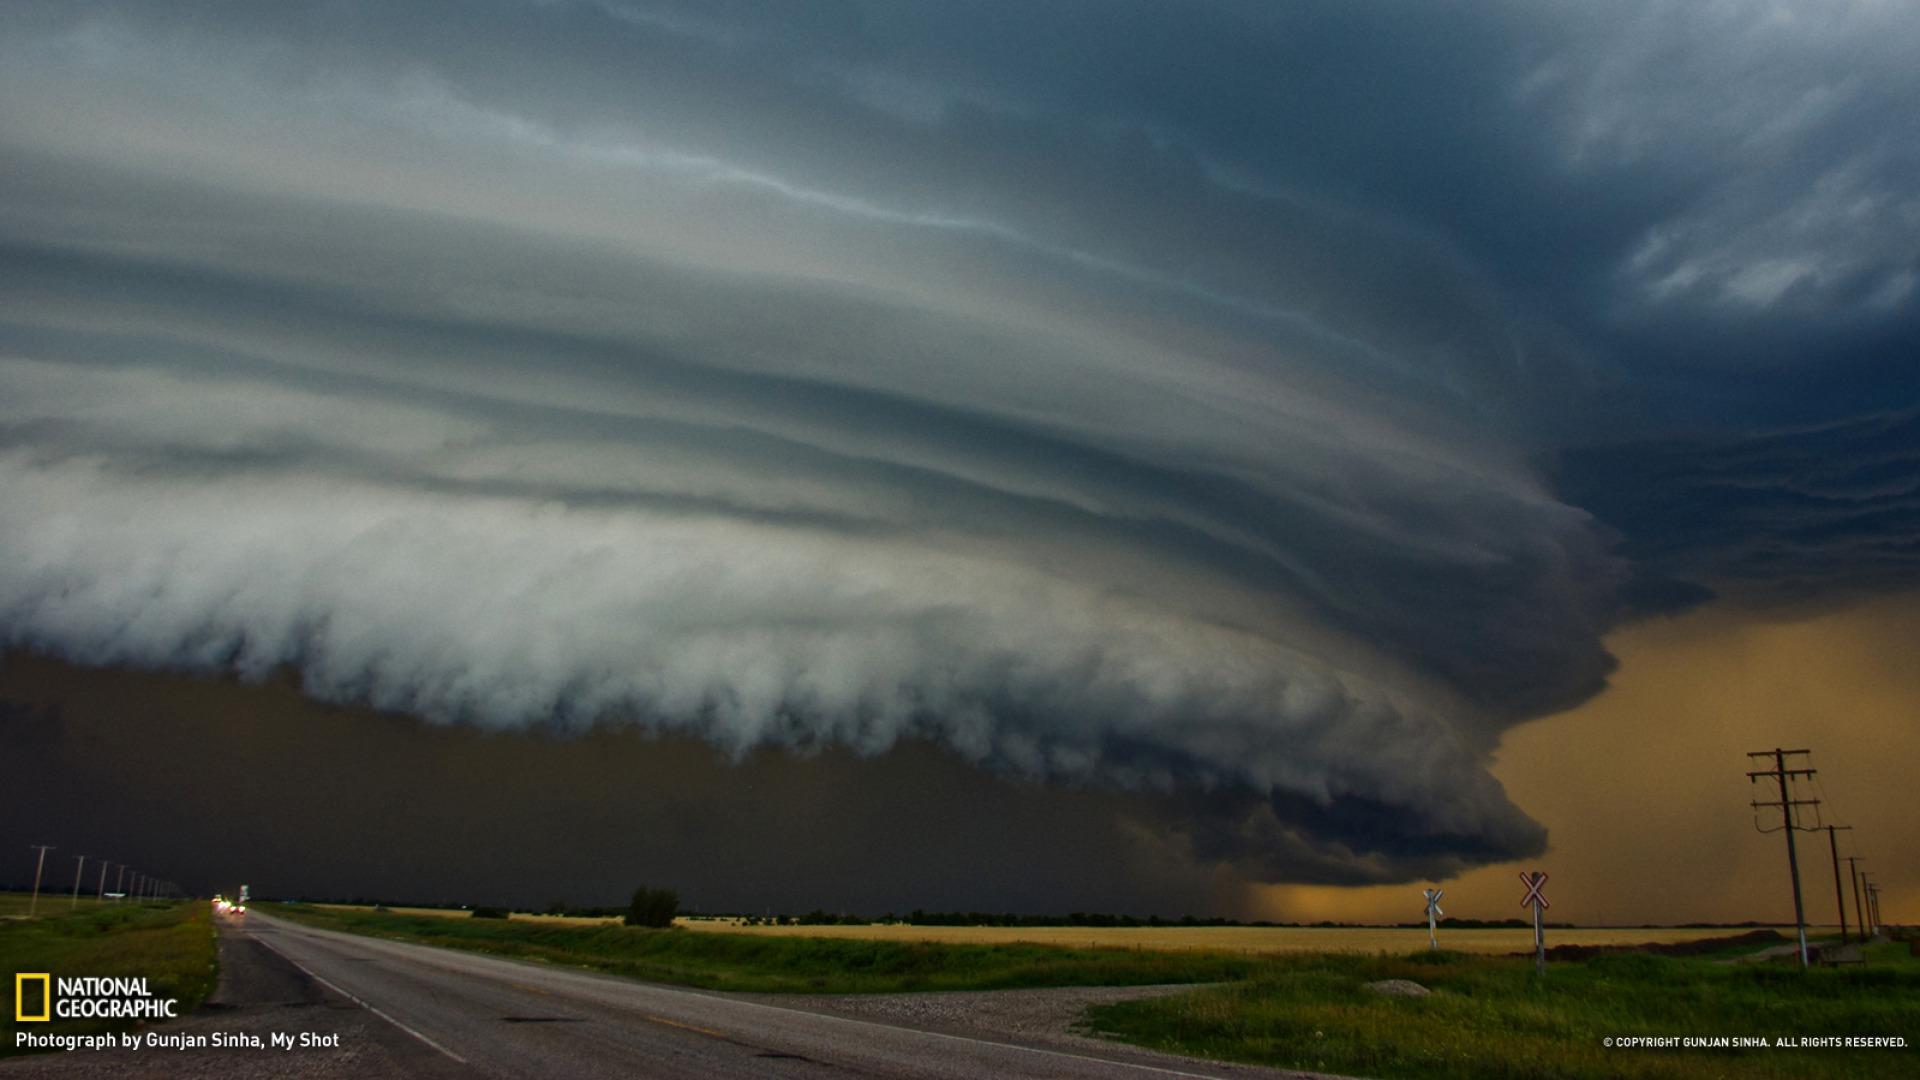 oklahoma tornado wallpaper 2013jpg 1920x1080